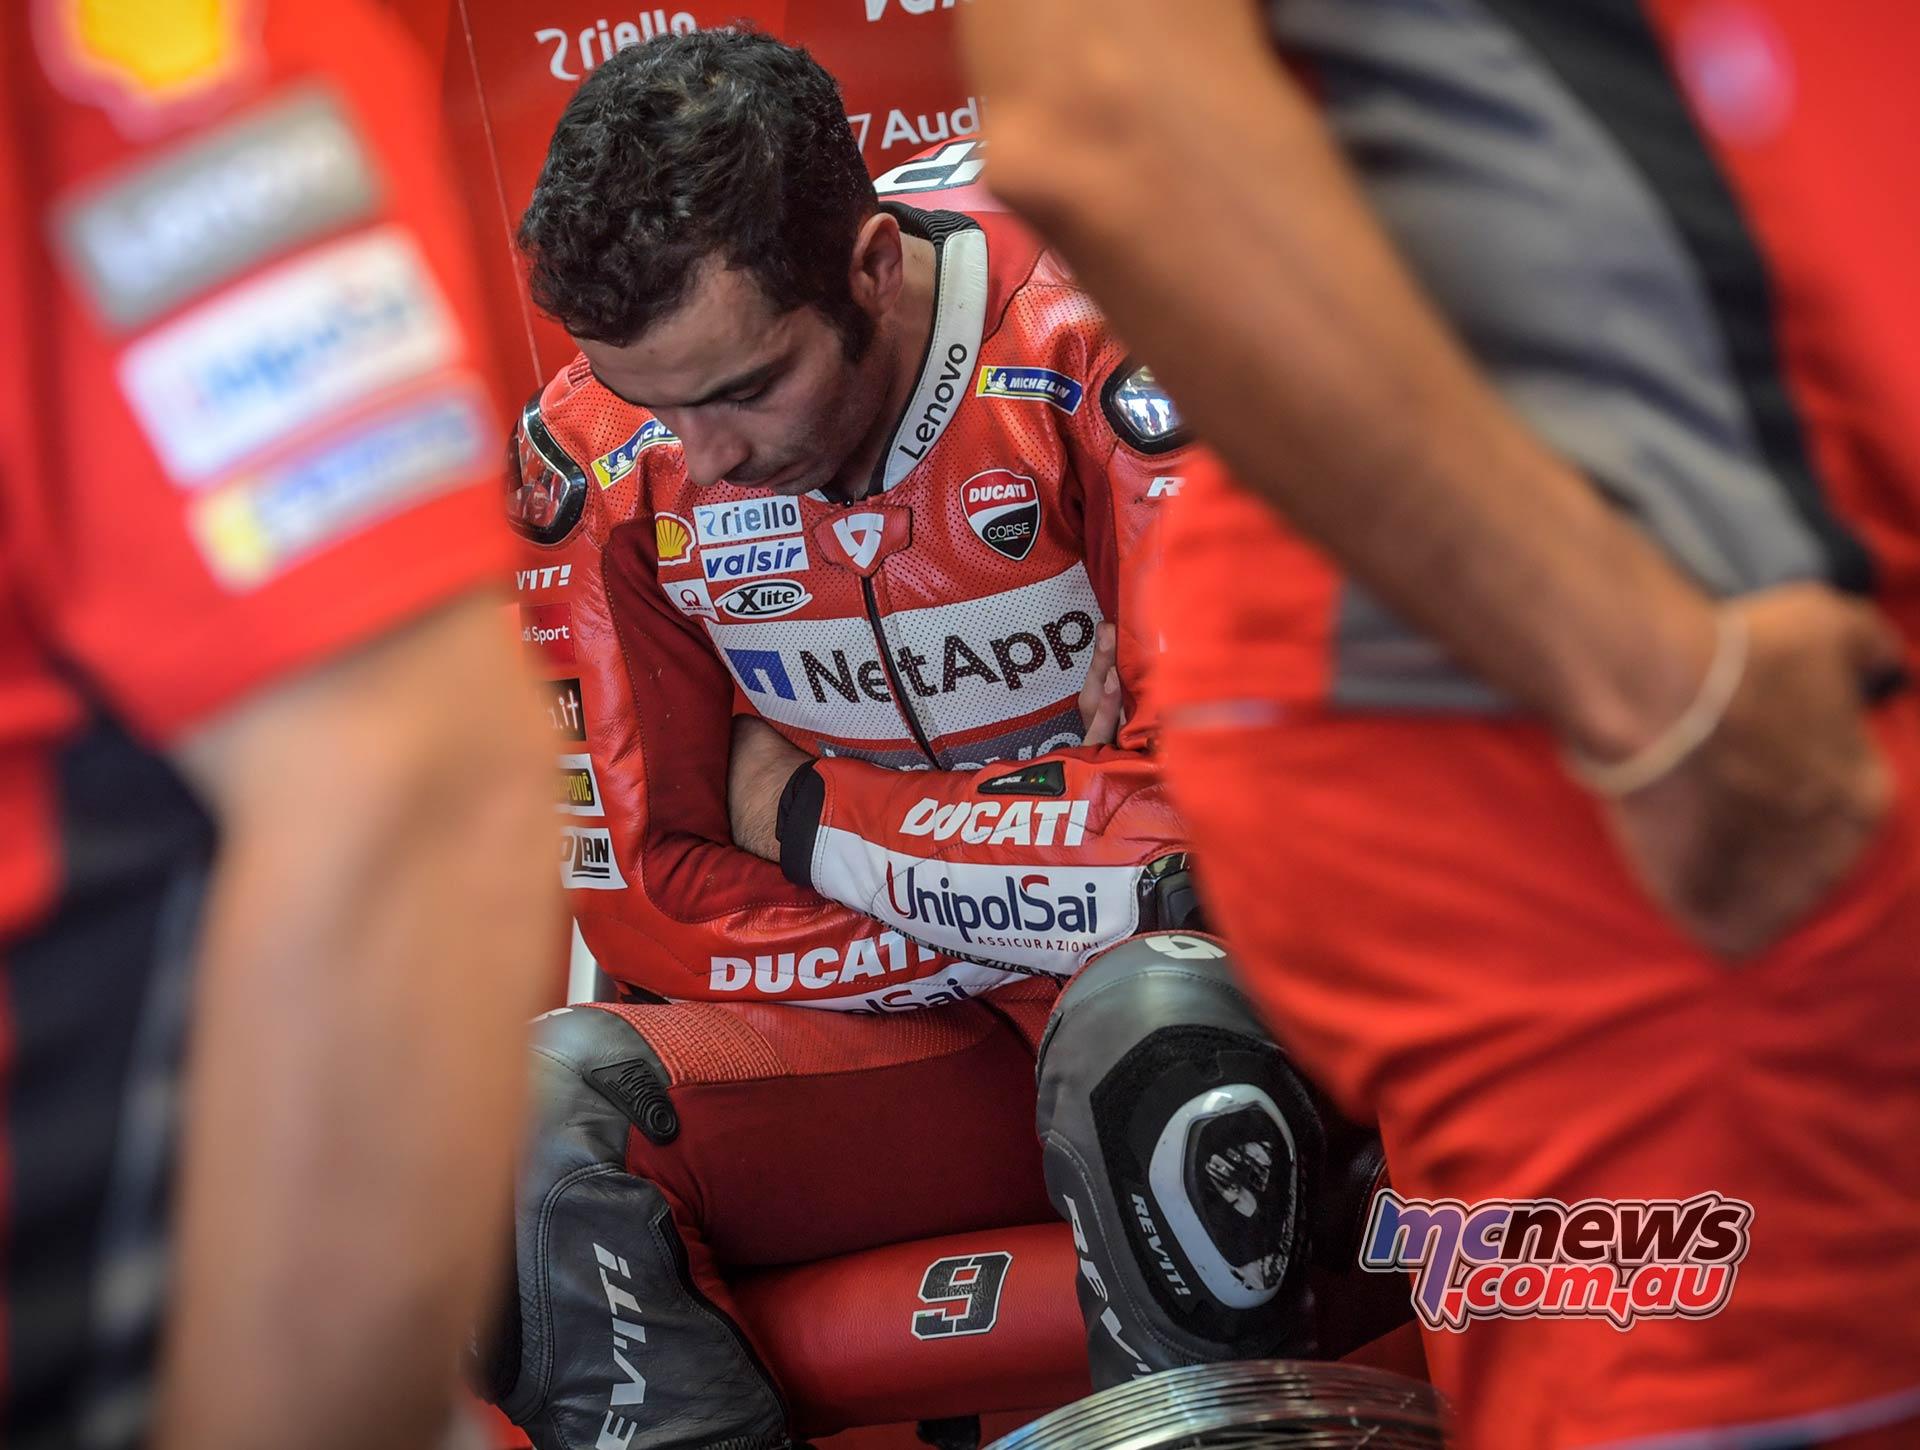 MotoGP Rnd Silverstone QP Petrucci